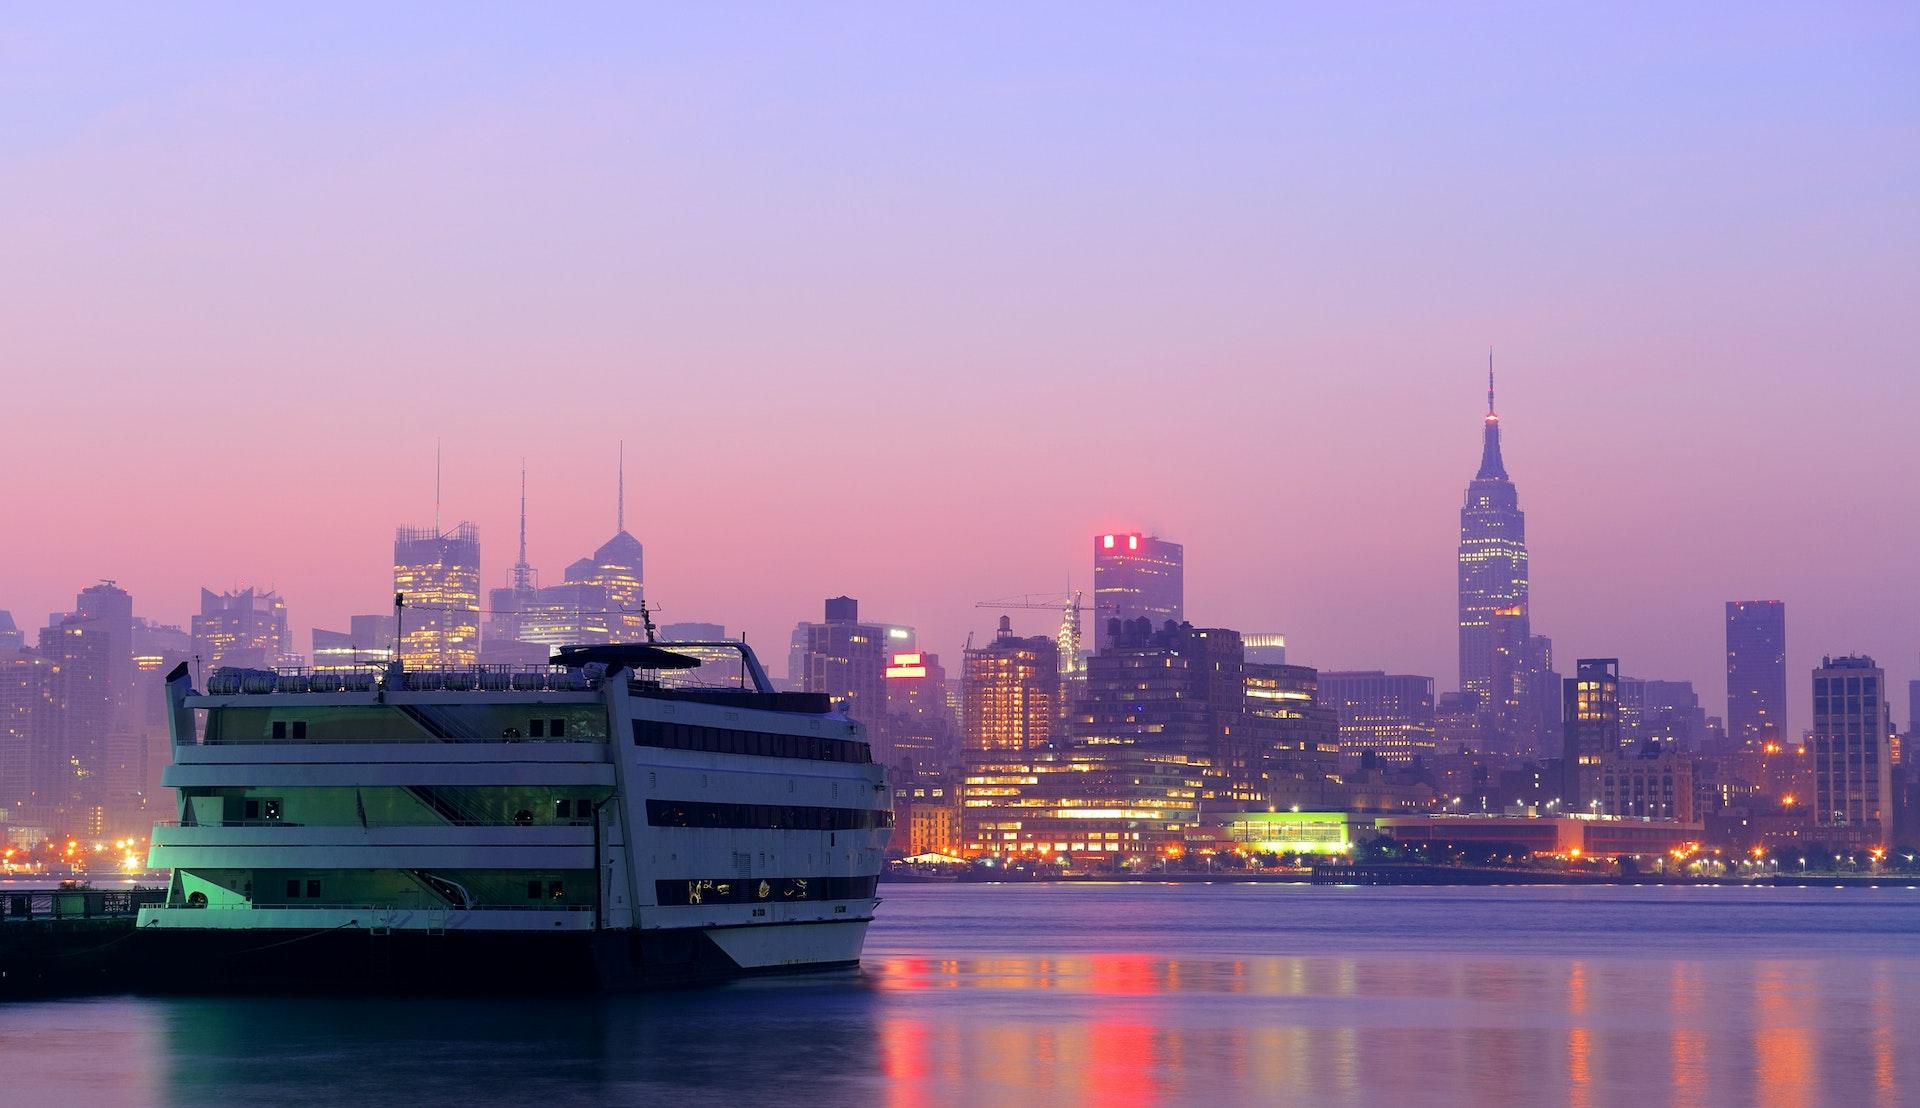 Cruise i New York © rabbit75_ist, Getty Images